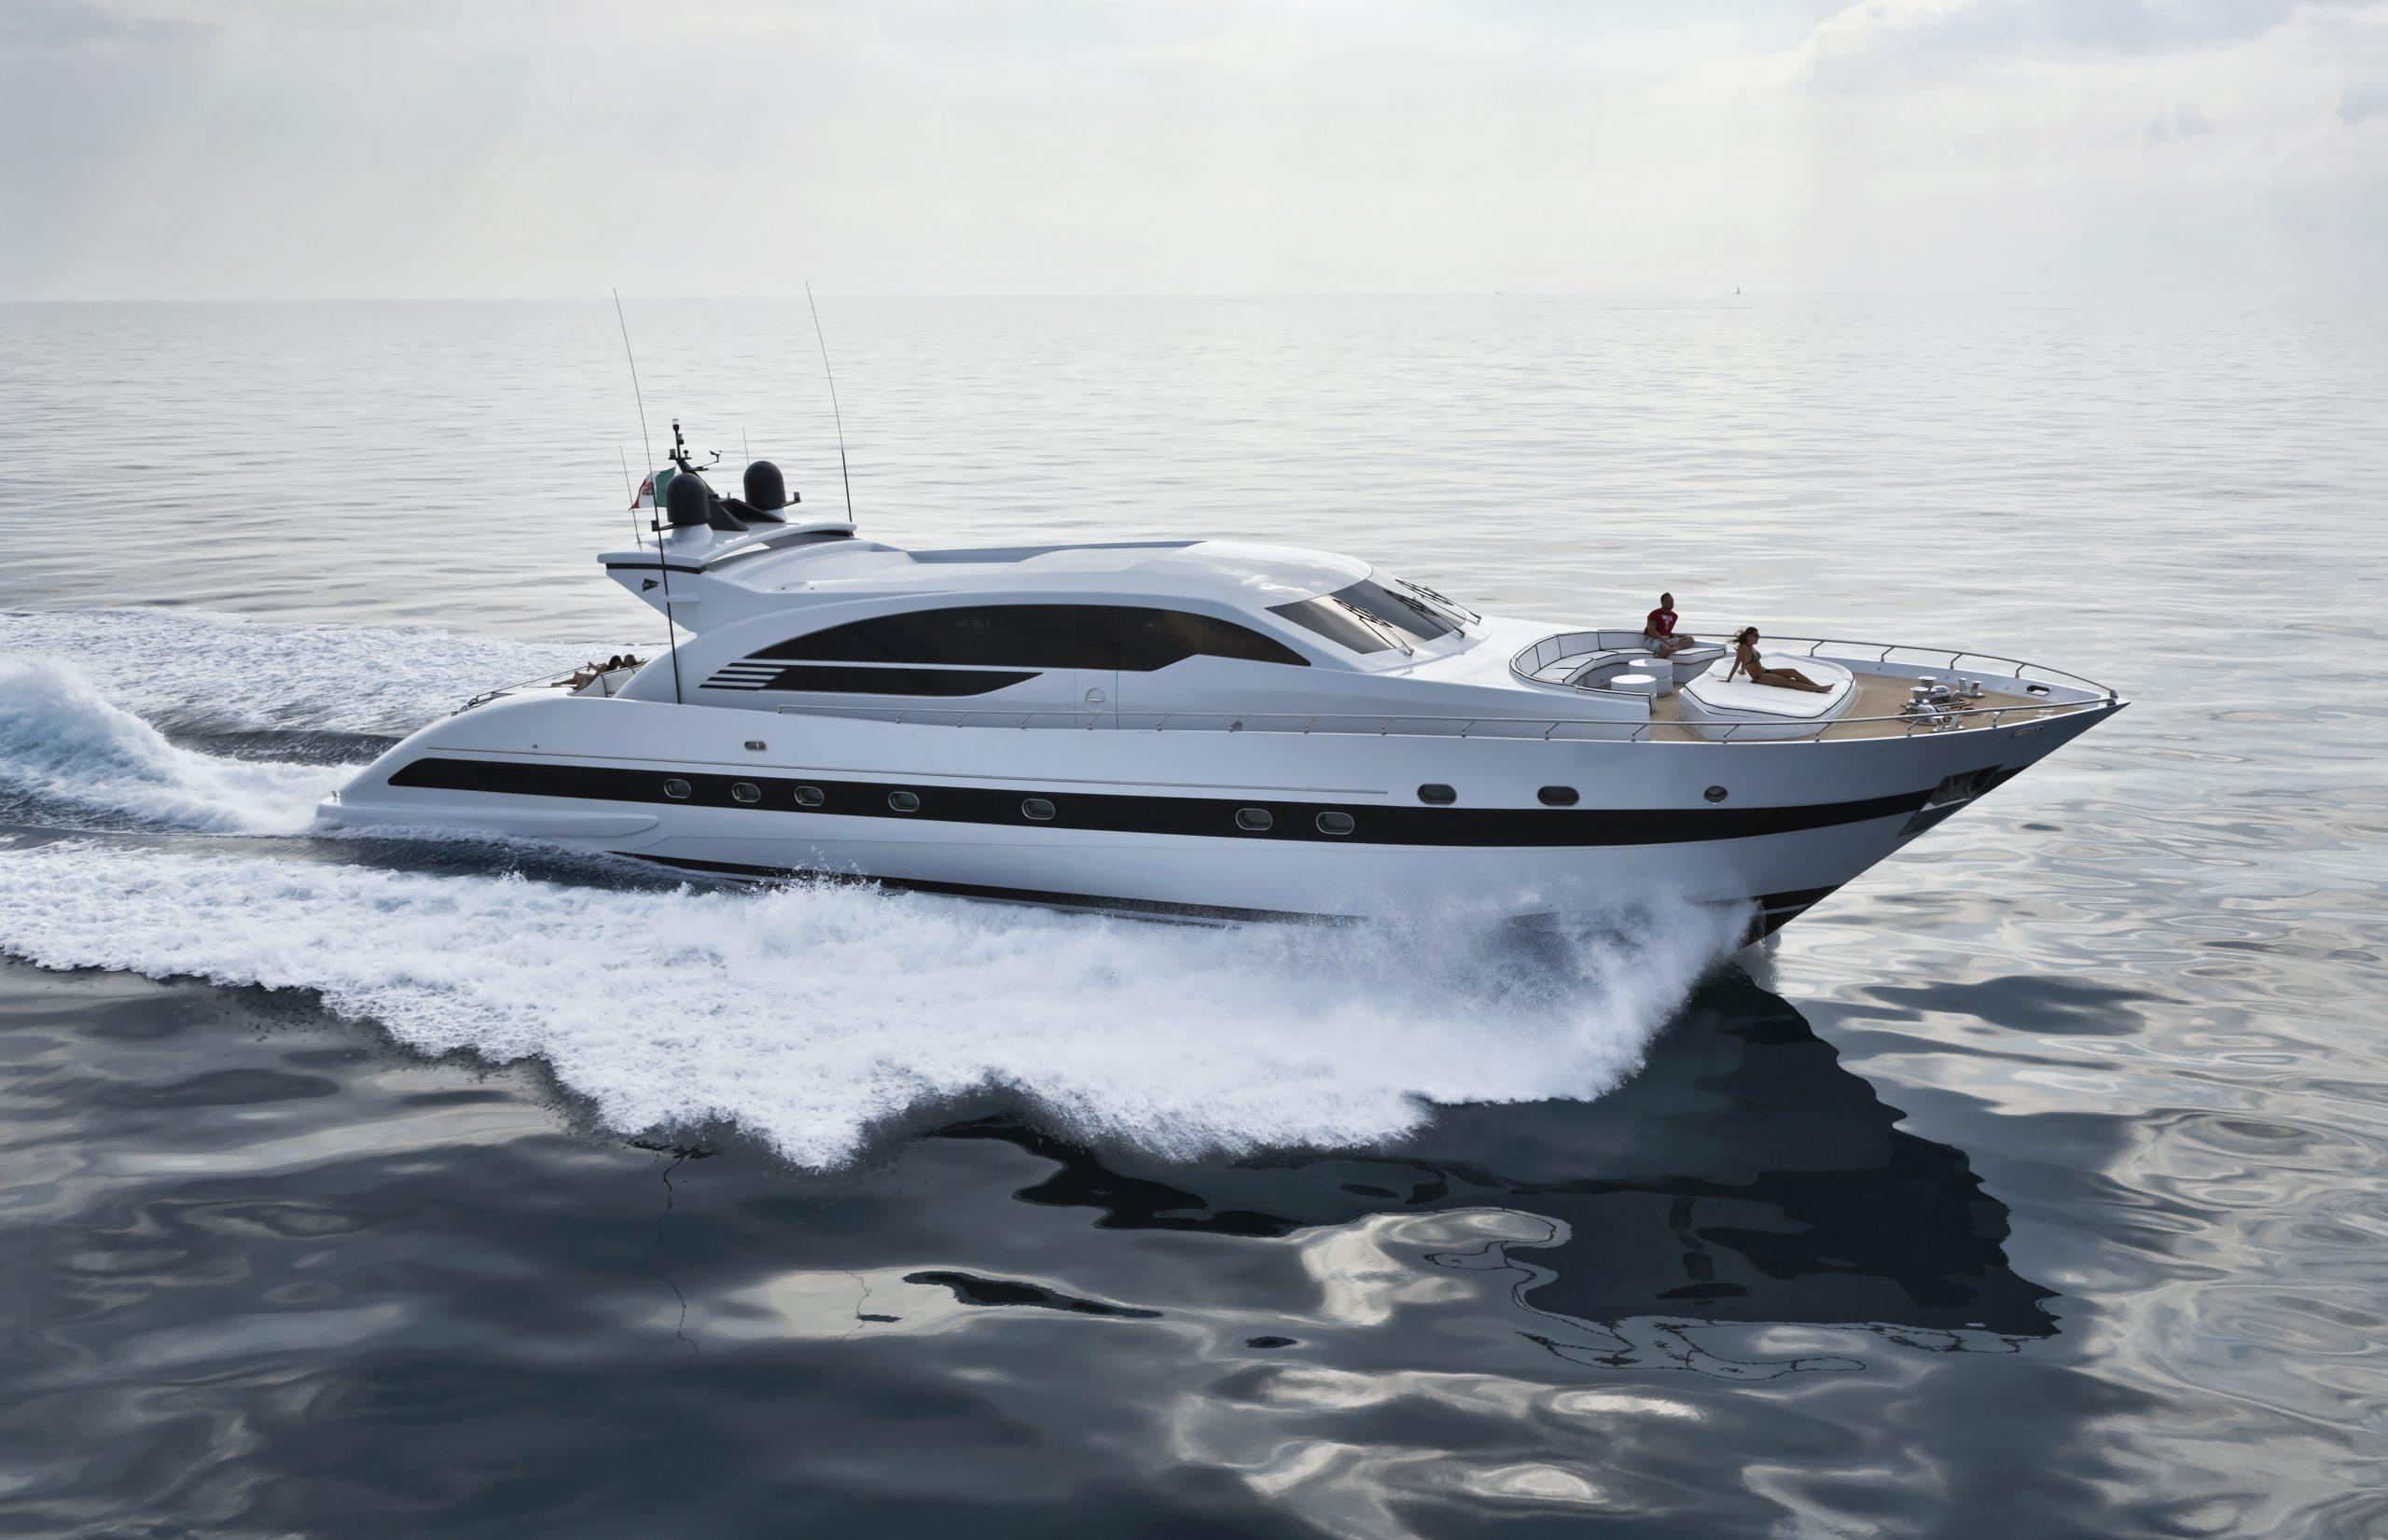 Italy, Tuscany, Viareggio, Tecnomar Velvet 100' luxury yacht, aerial view